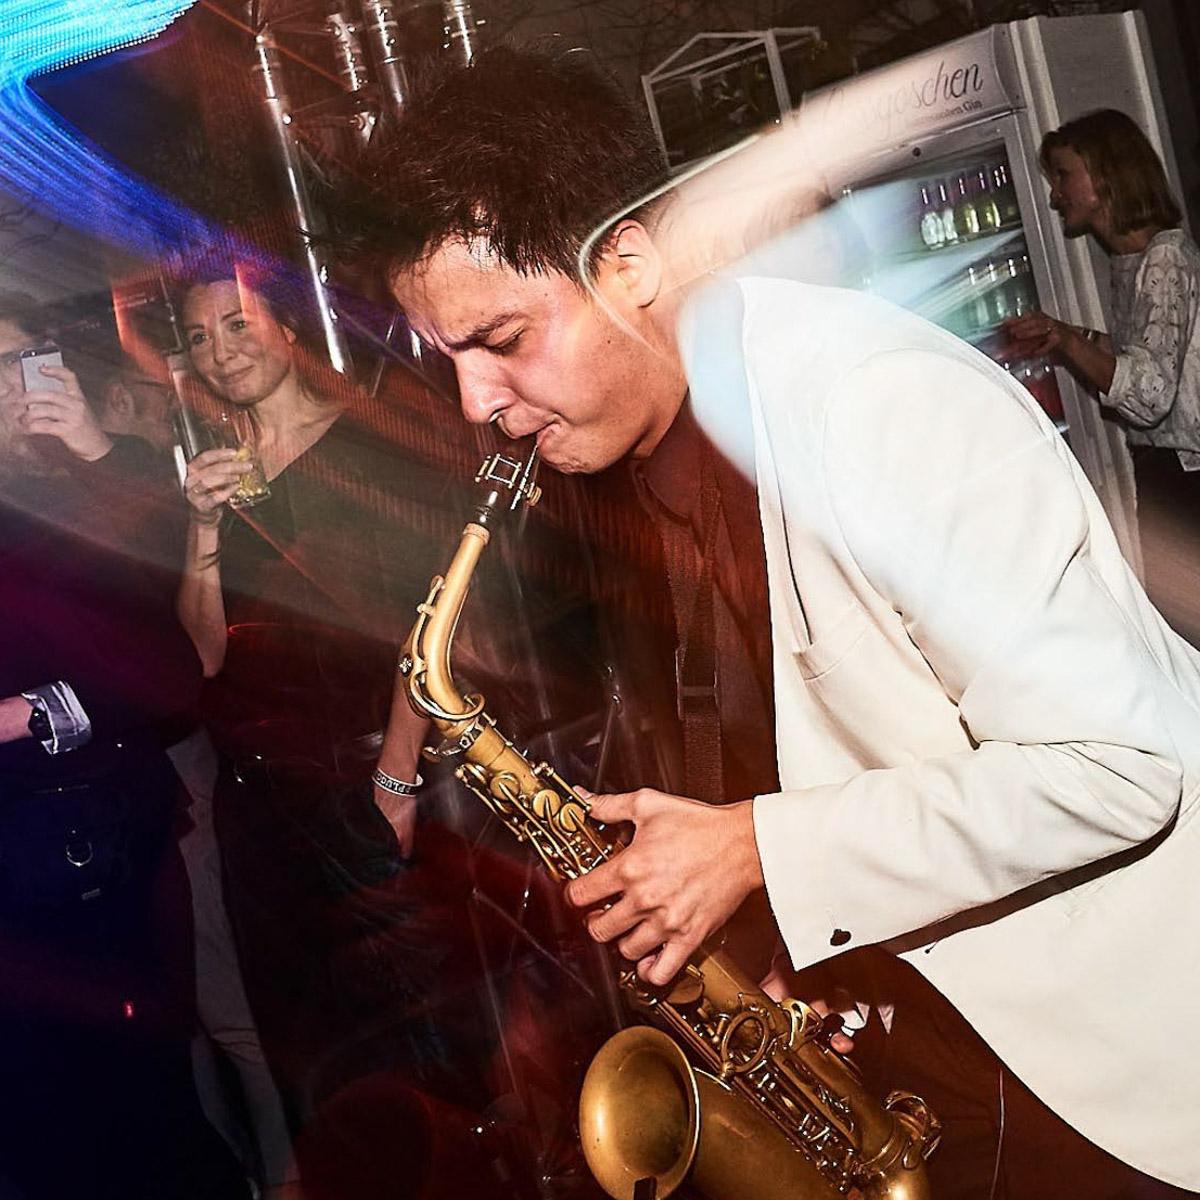 Saxophonist |Saxophonspieler |House |Techno |Electro |DJ |Combo |Party |Highlighte |Buchen |Mieten |Anfragen |Lehmann |Eventservice